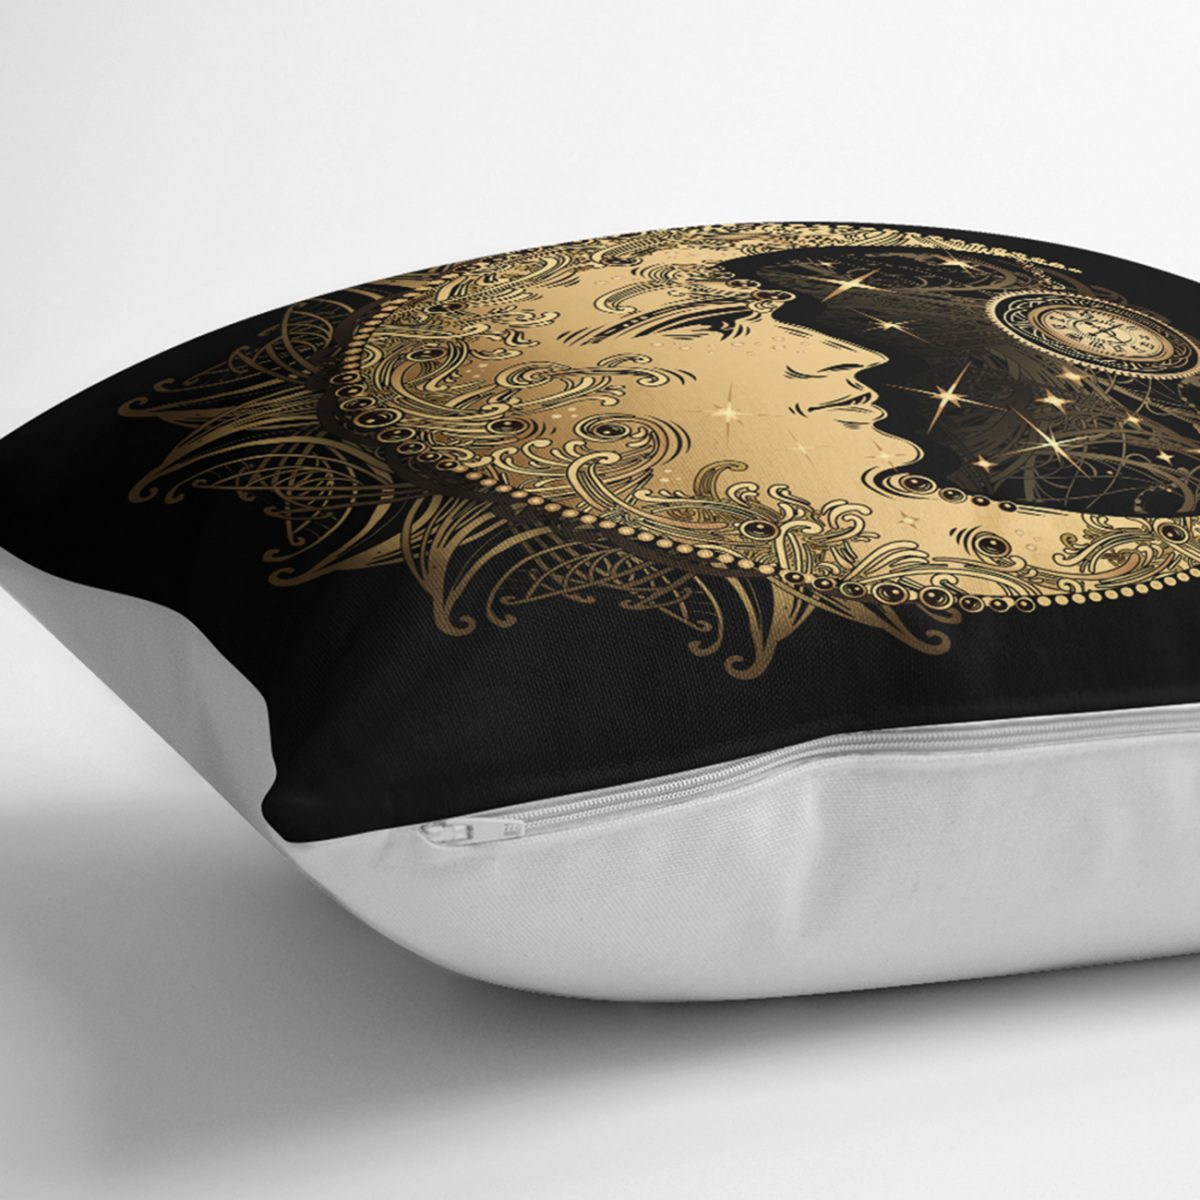 RealHomes Özel Tasarım Gold Ay Desenli Saat Kırlent Kılıfı Realhomes